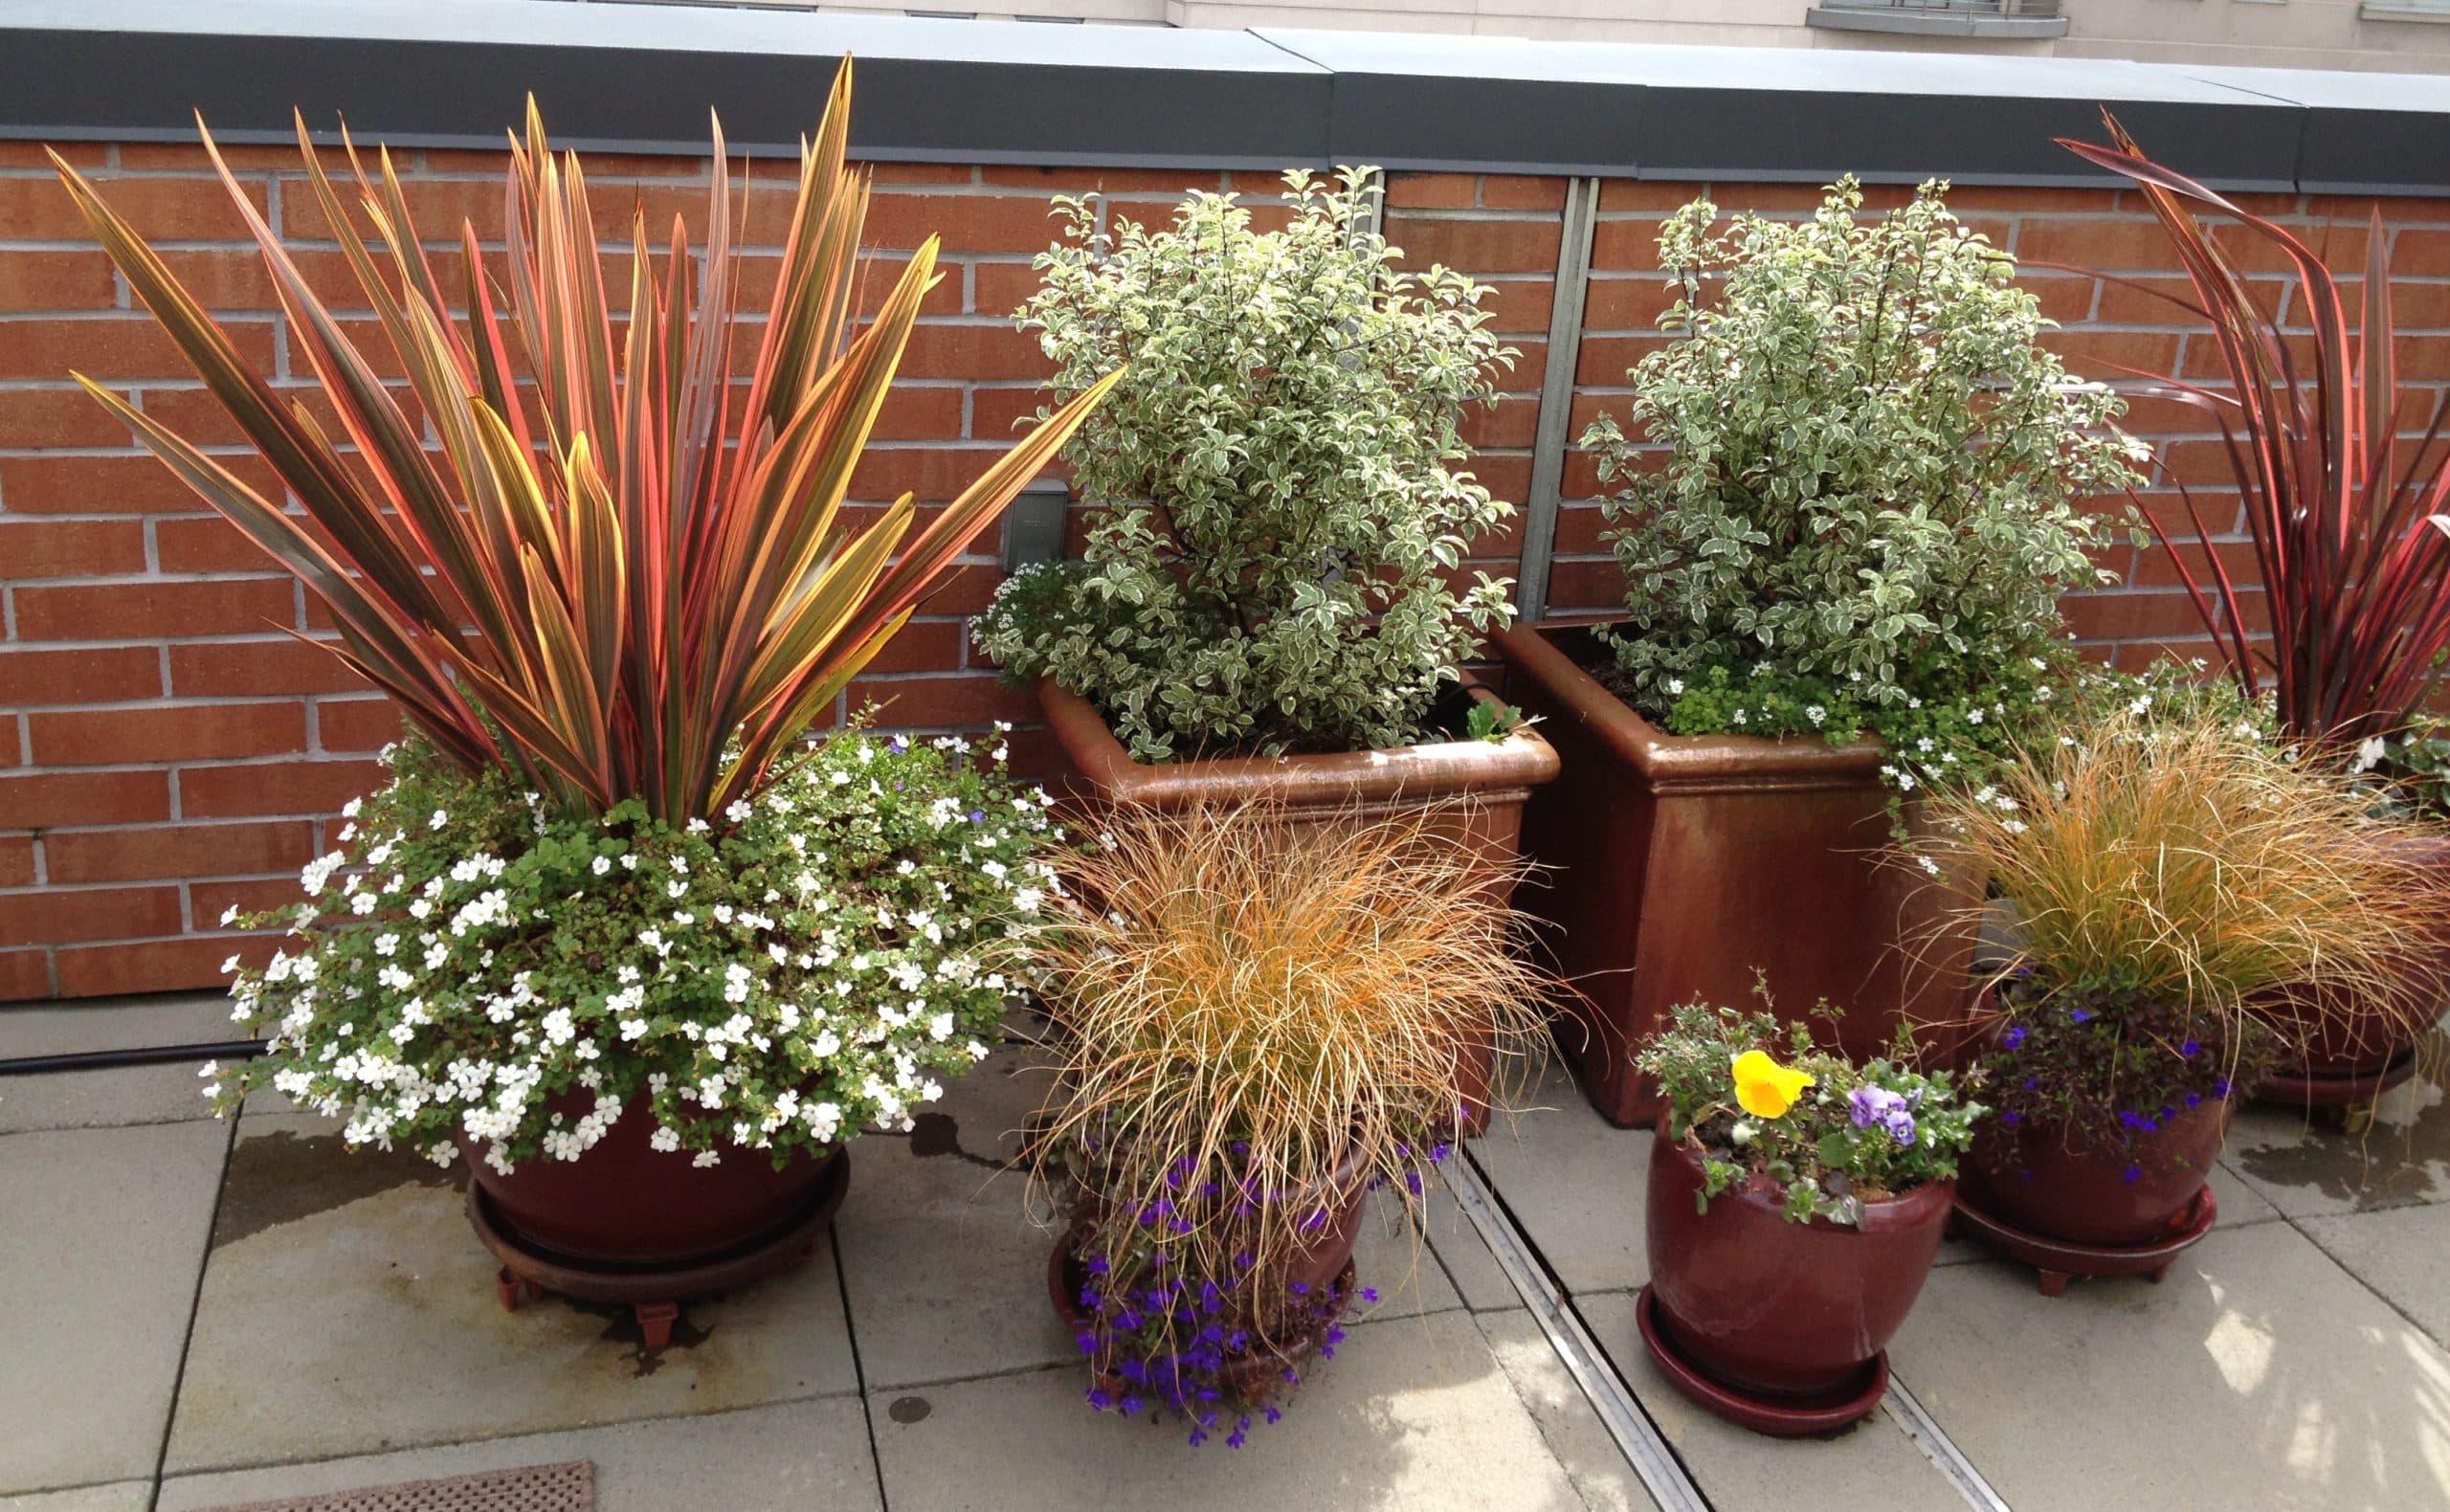 Garden Design Department - Sloat Garden Center